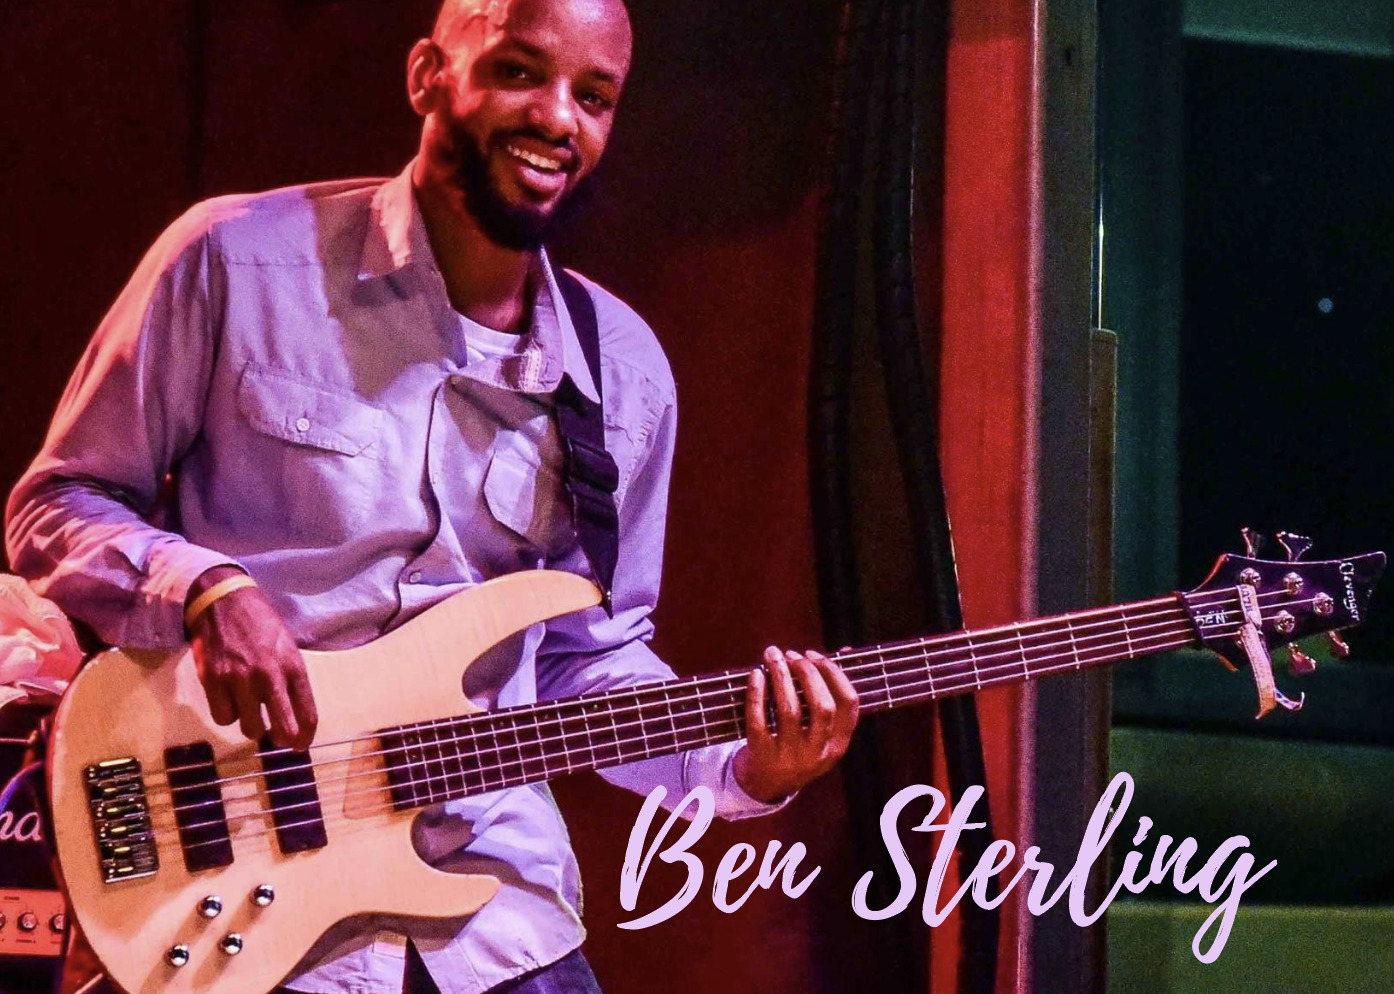 Ben Sterling at FJC